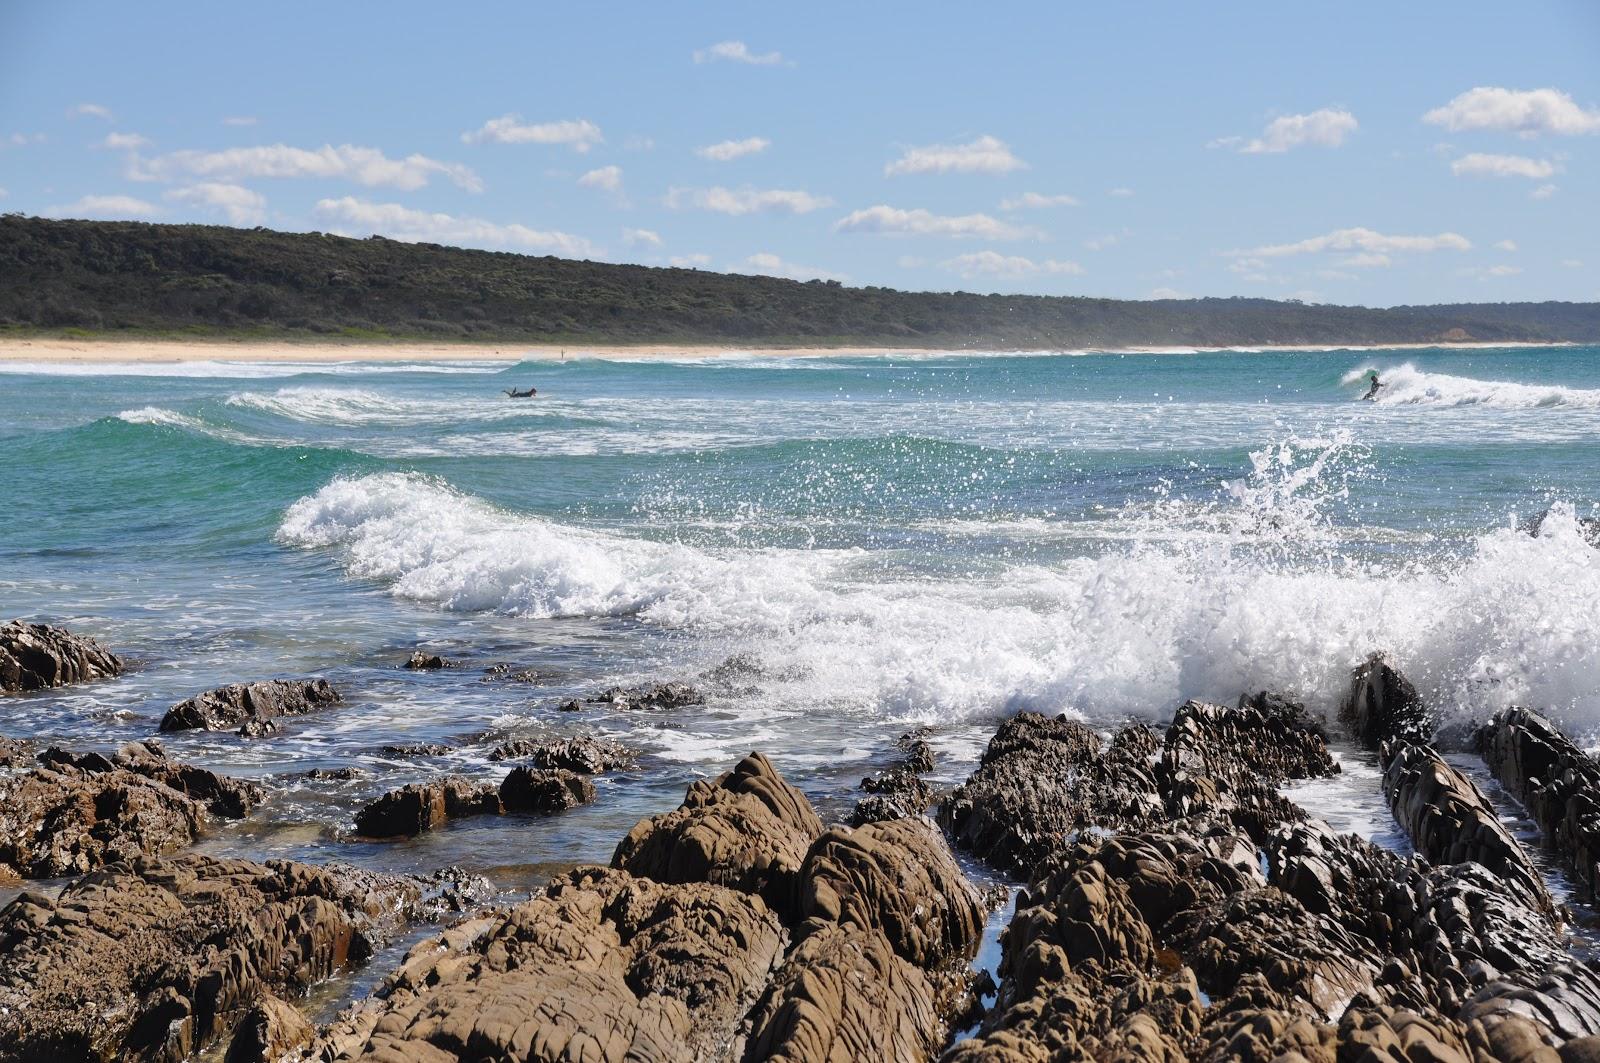 ocean waves hitting rocks narooma wagonga inlet australia beautiful beach